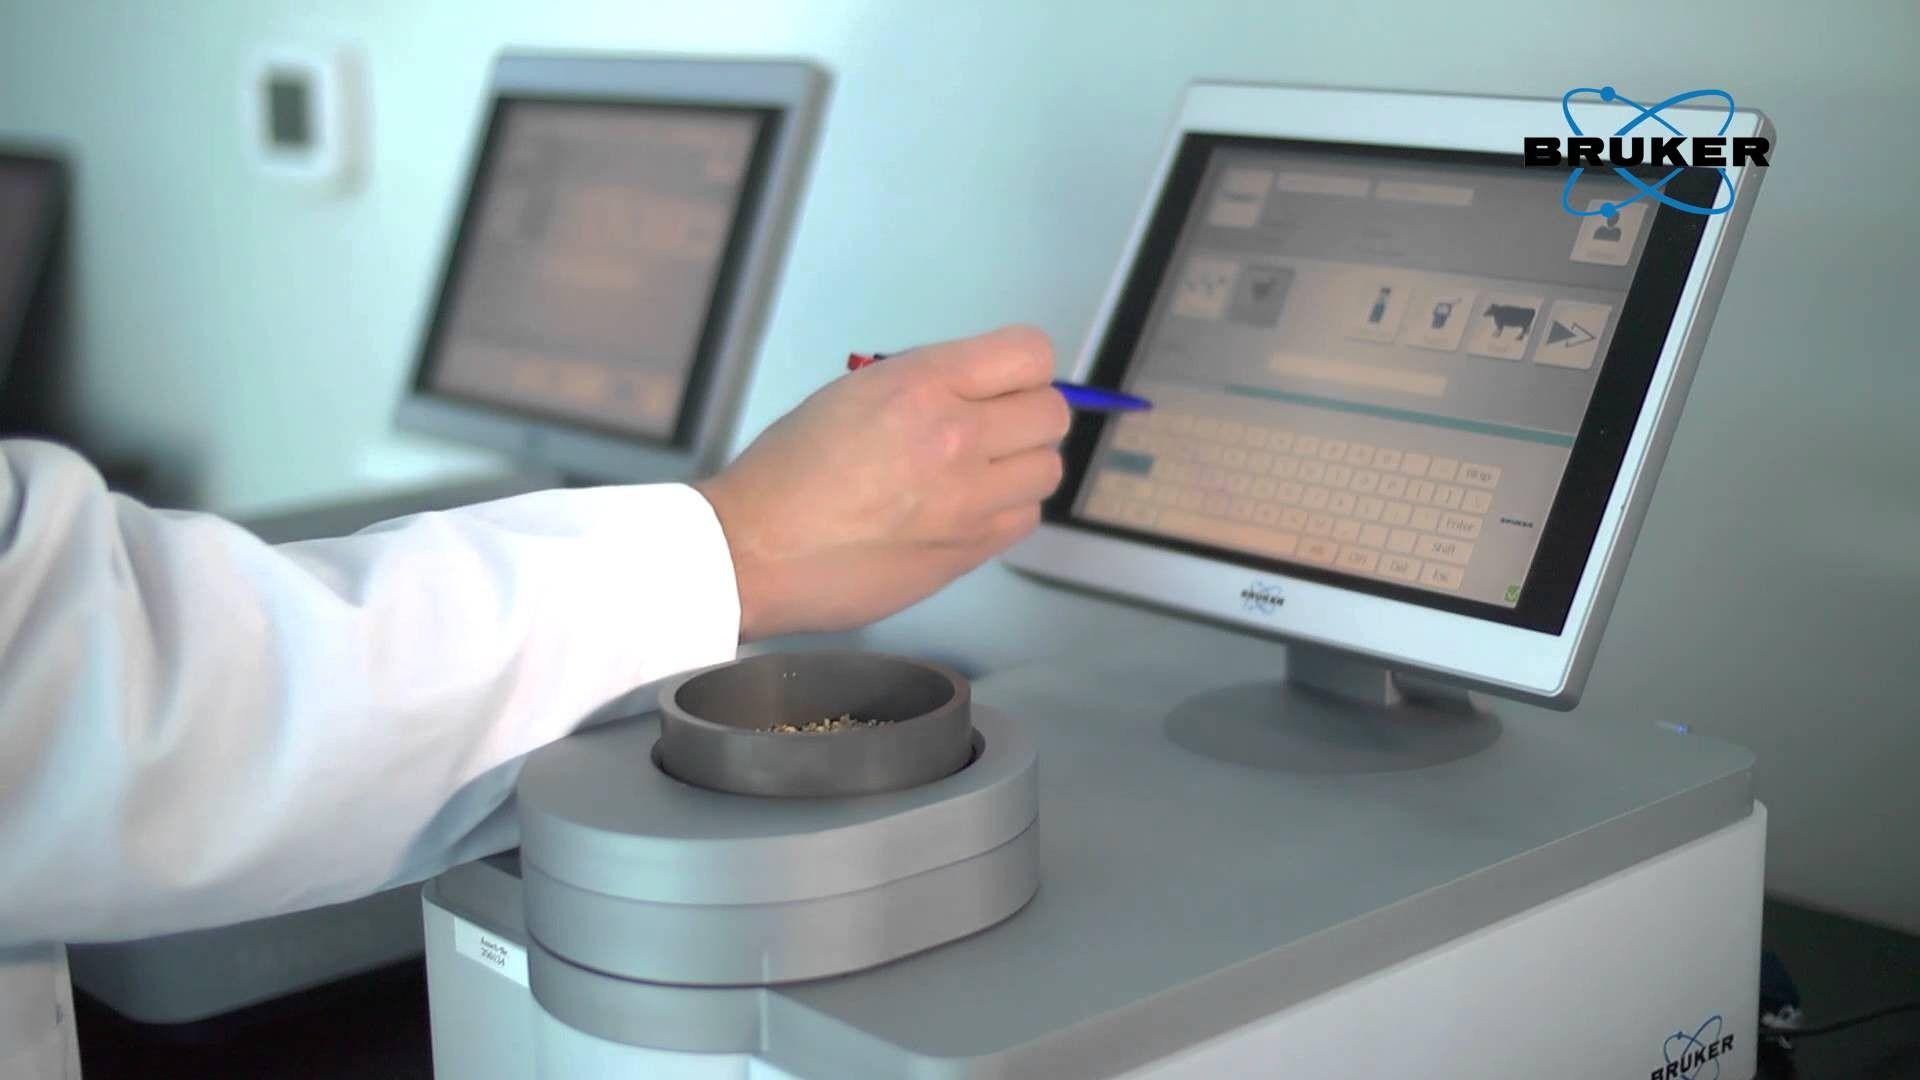 TANGO ИК-Фурье спектрометр ближний ИК-диапазон